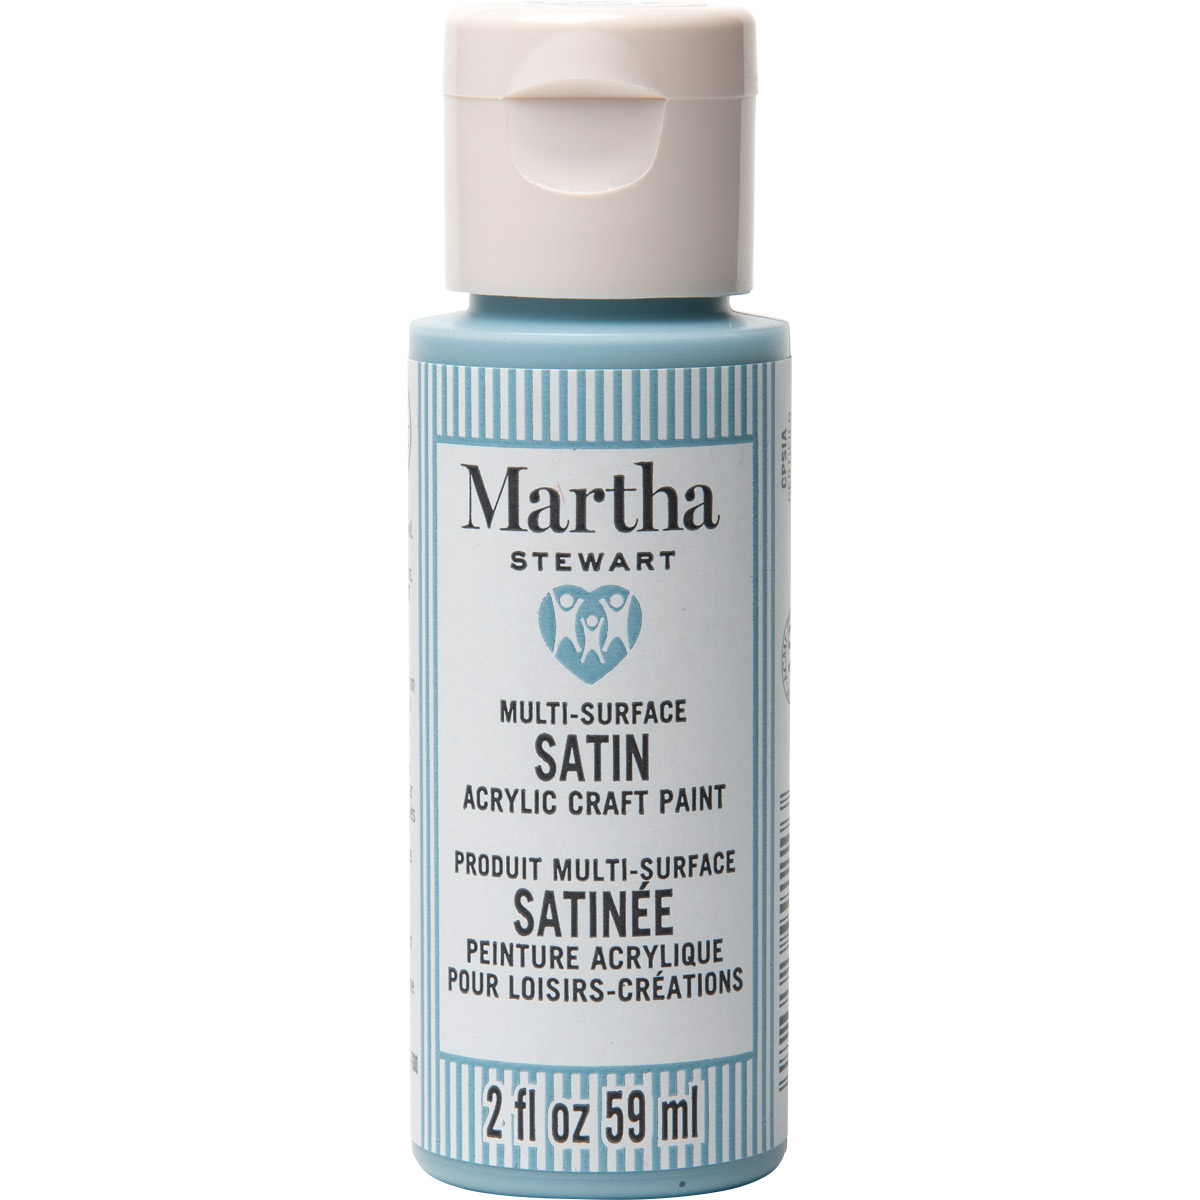 Martha Stewart® 2oz Multi-Surface Satin Acrylic Craft Paint - Morning Mist